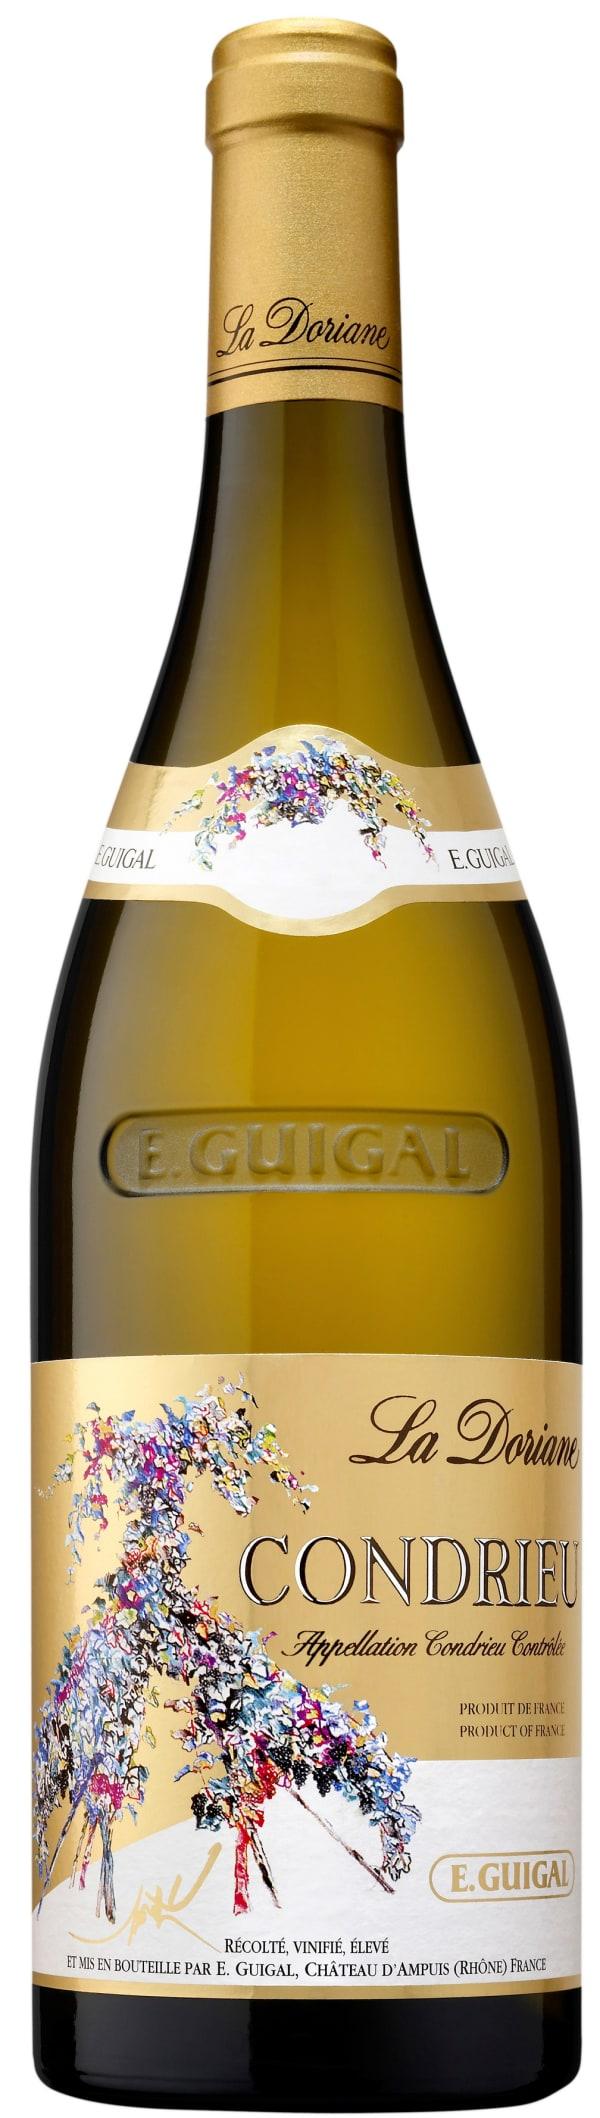 E. Guigal Condrieu La Doriane 2018